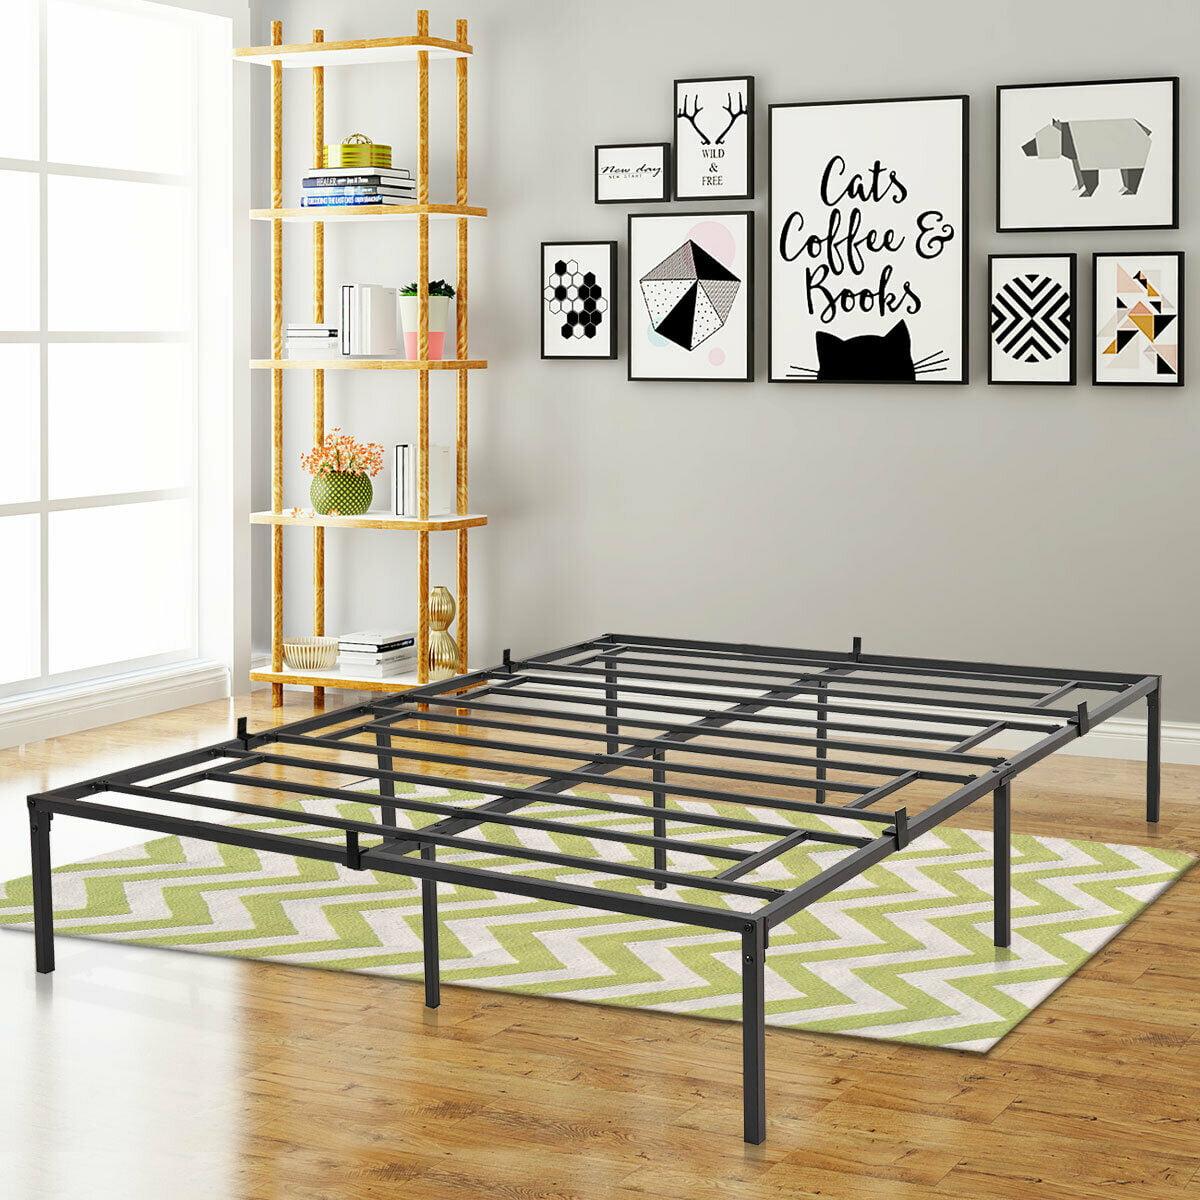 Image of: Black Heavy Duty Metal 14 16 5 Inch Tall Platform Standard Bed Frames 3000lbs Max Weight Capacity Twin Full Queen King Walmart Com Walmart Com